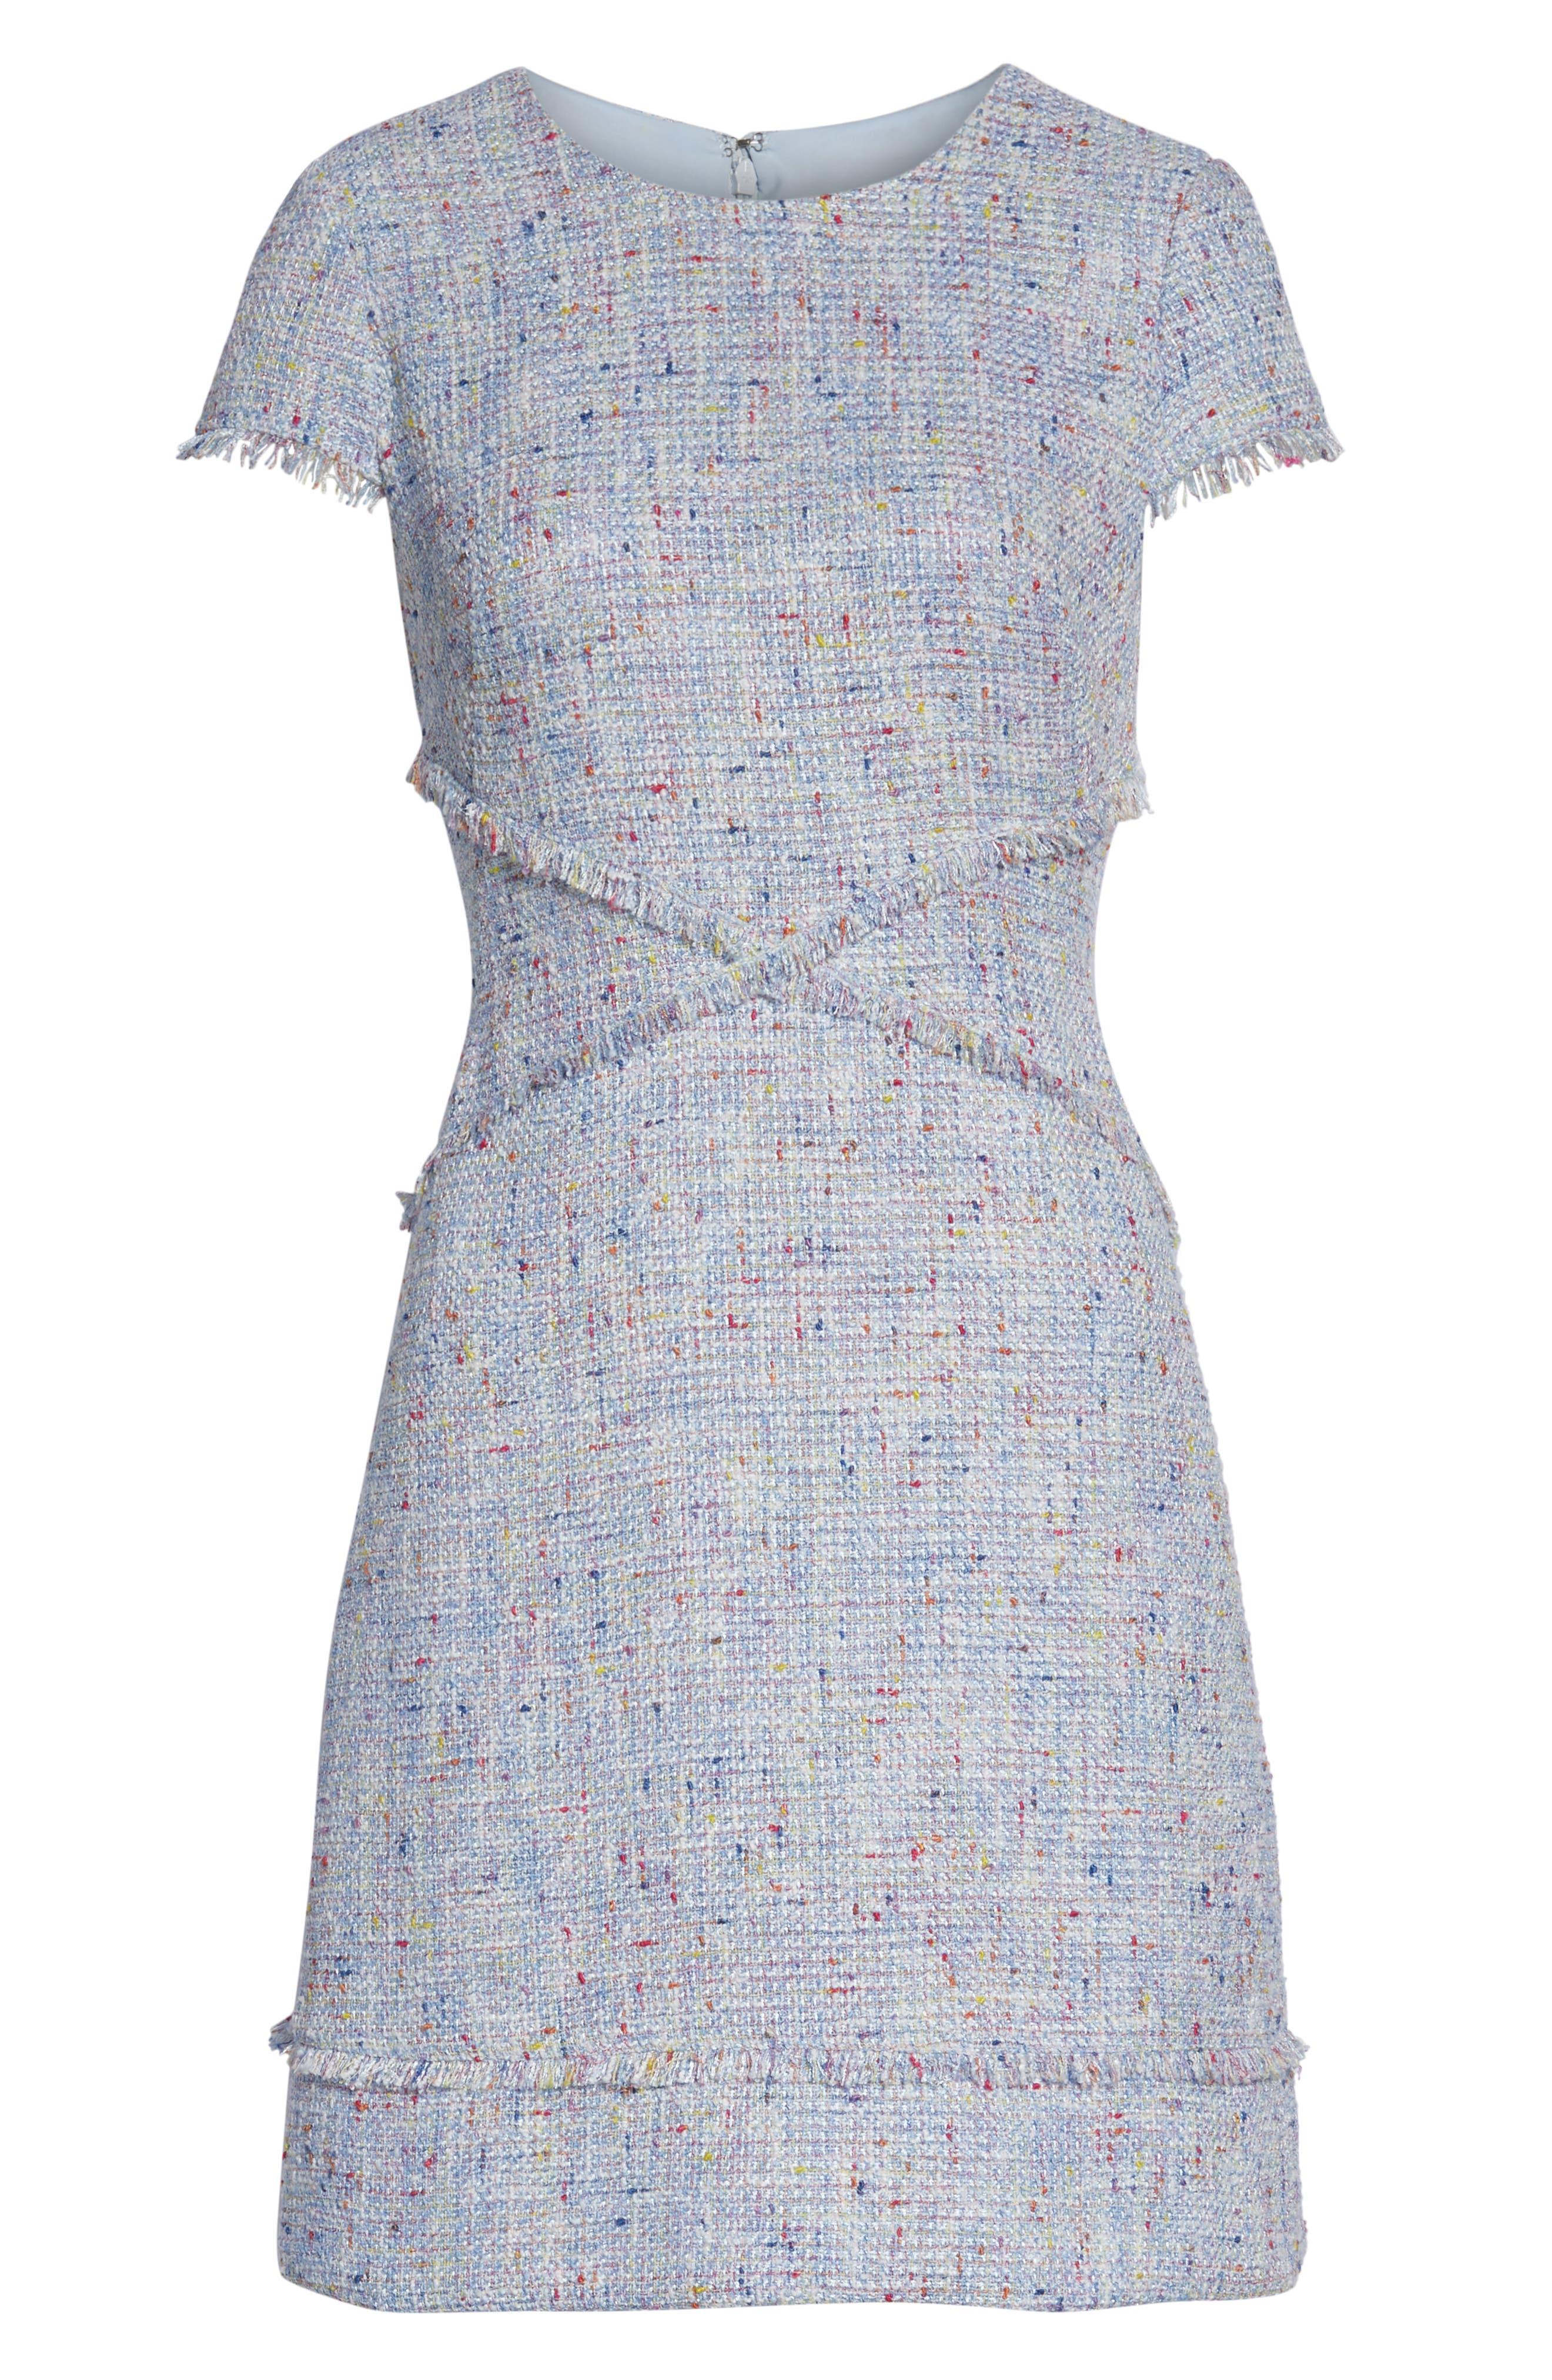 ELIZA J, Sheath Tweed Sheath Dress, Alternate thumbnail 7, color, BLUE